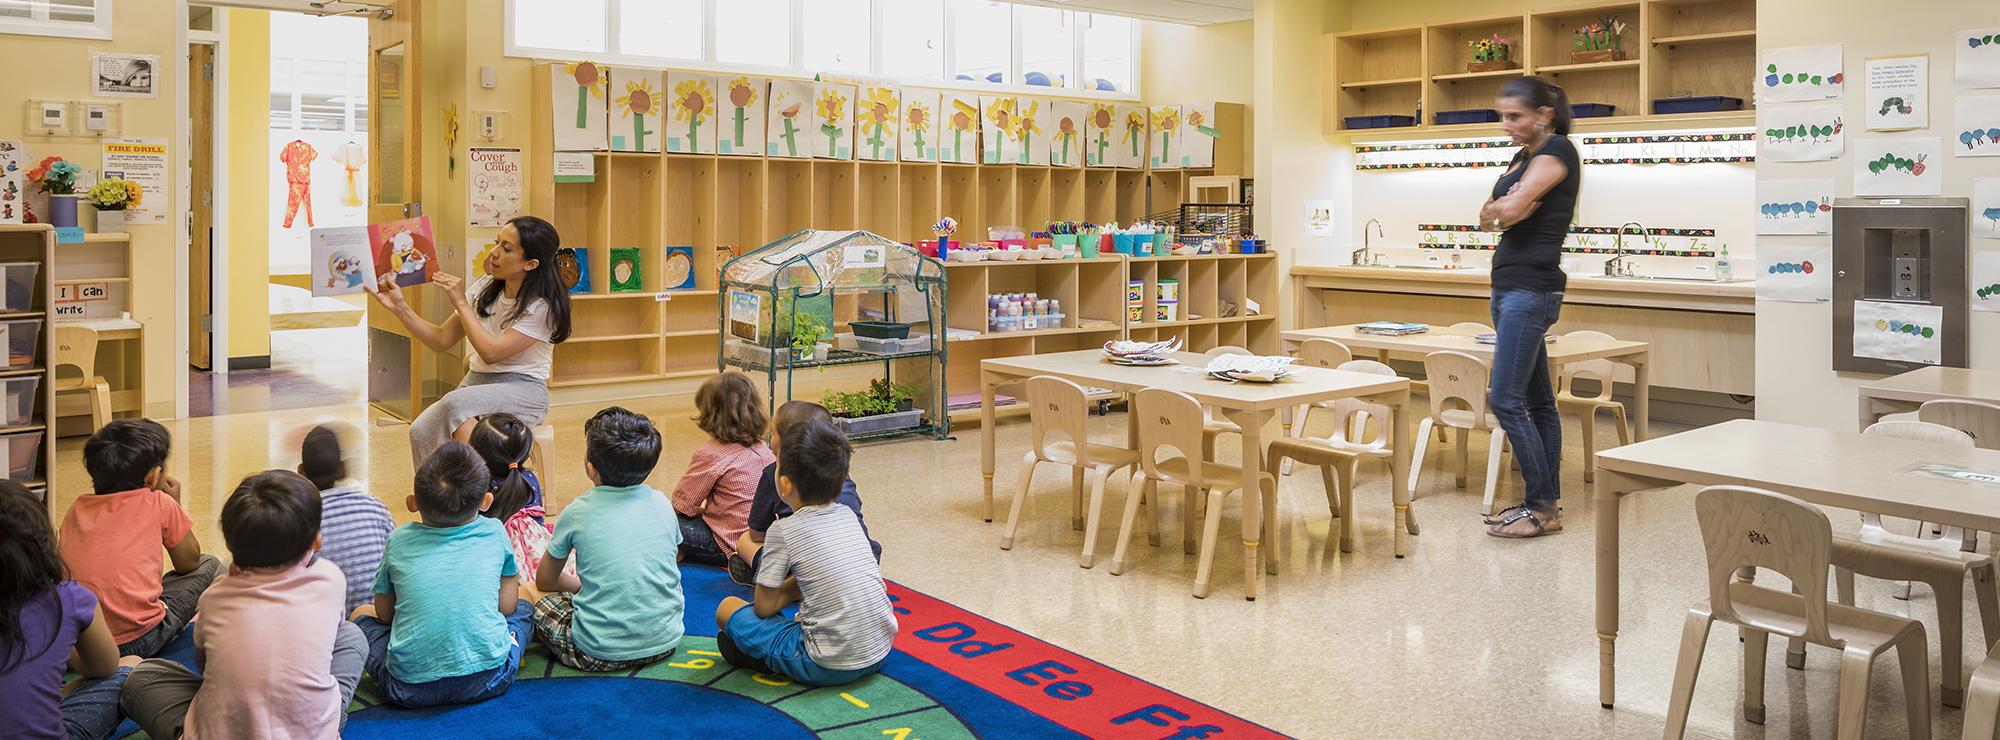 10BouckCourt_7-classroom-cropped